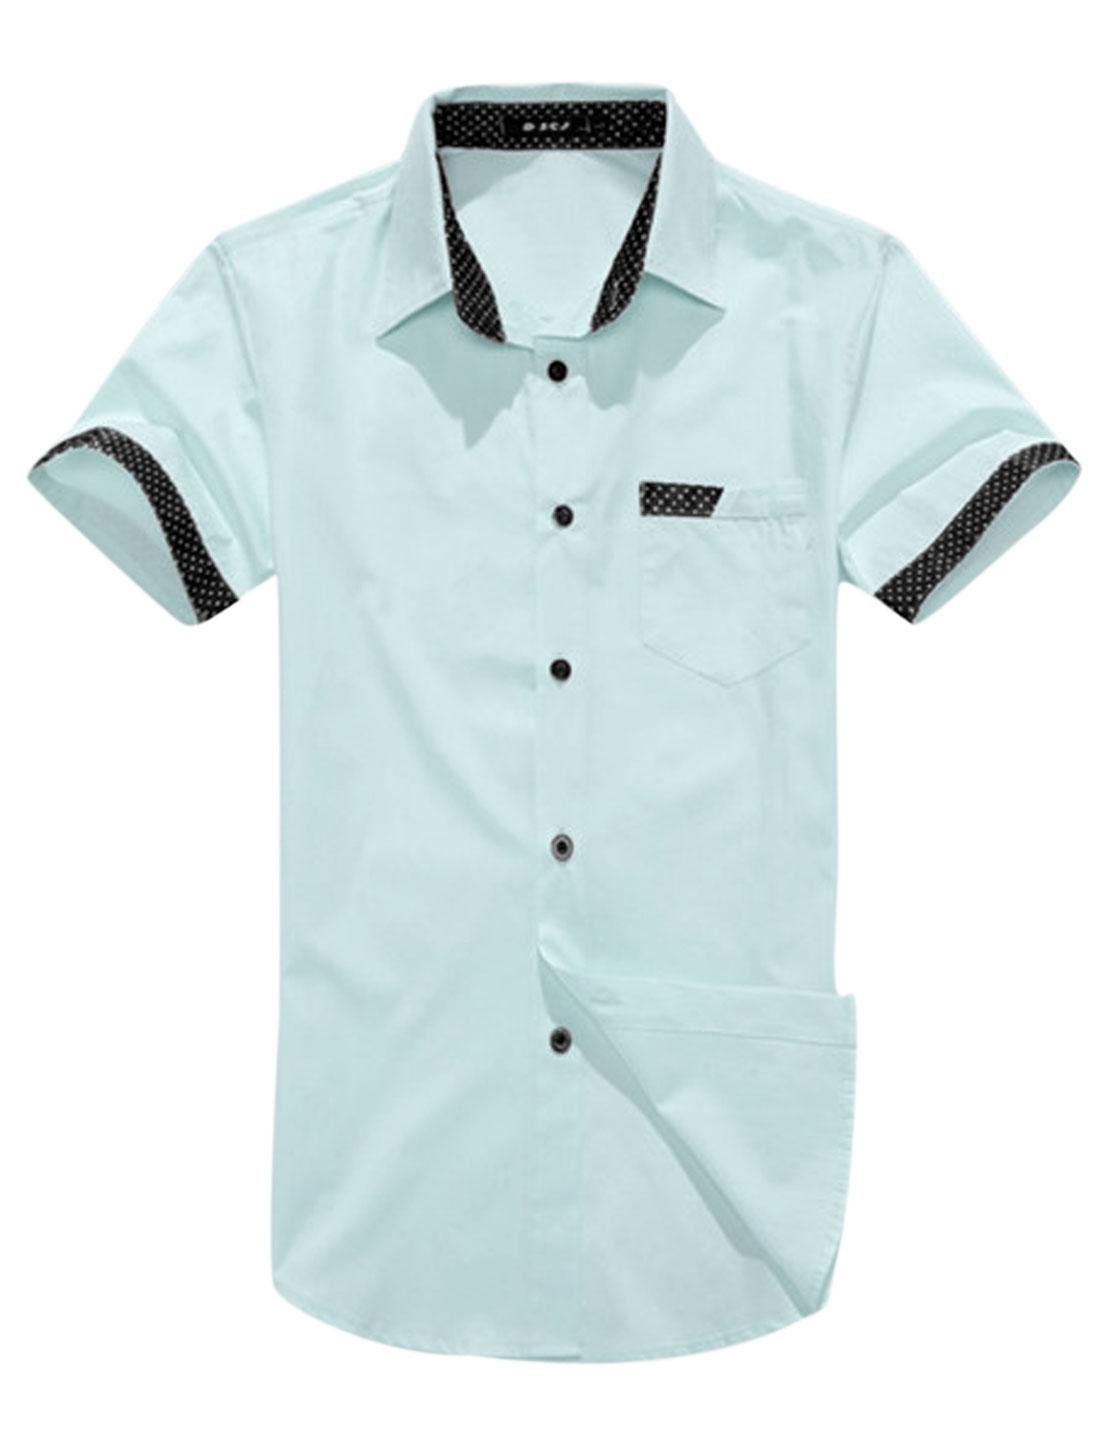 Man Dots Prints Detail Button Down One Chest Pocket Casual Shirt Sky Blue M